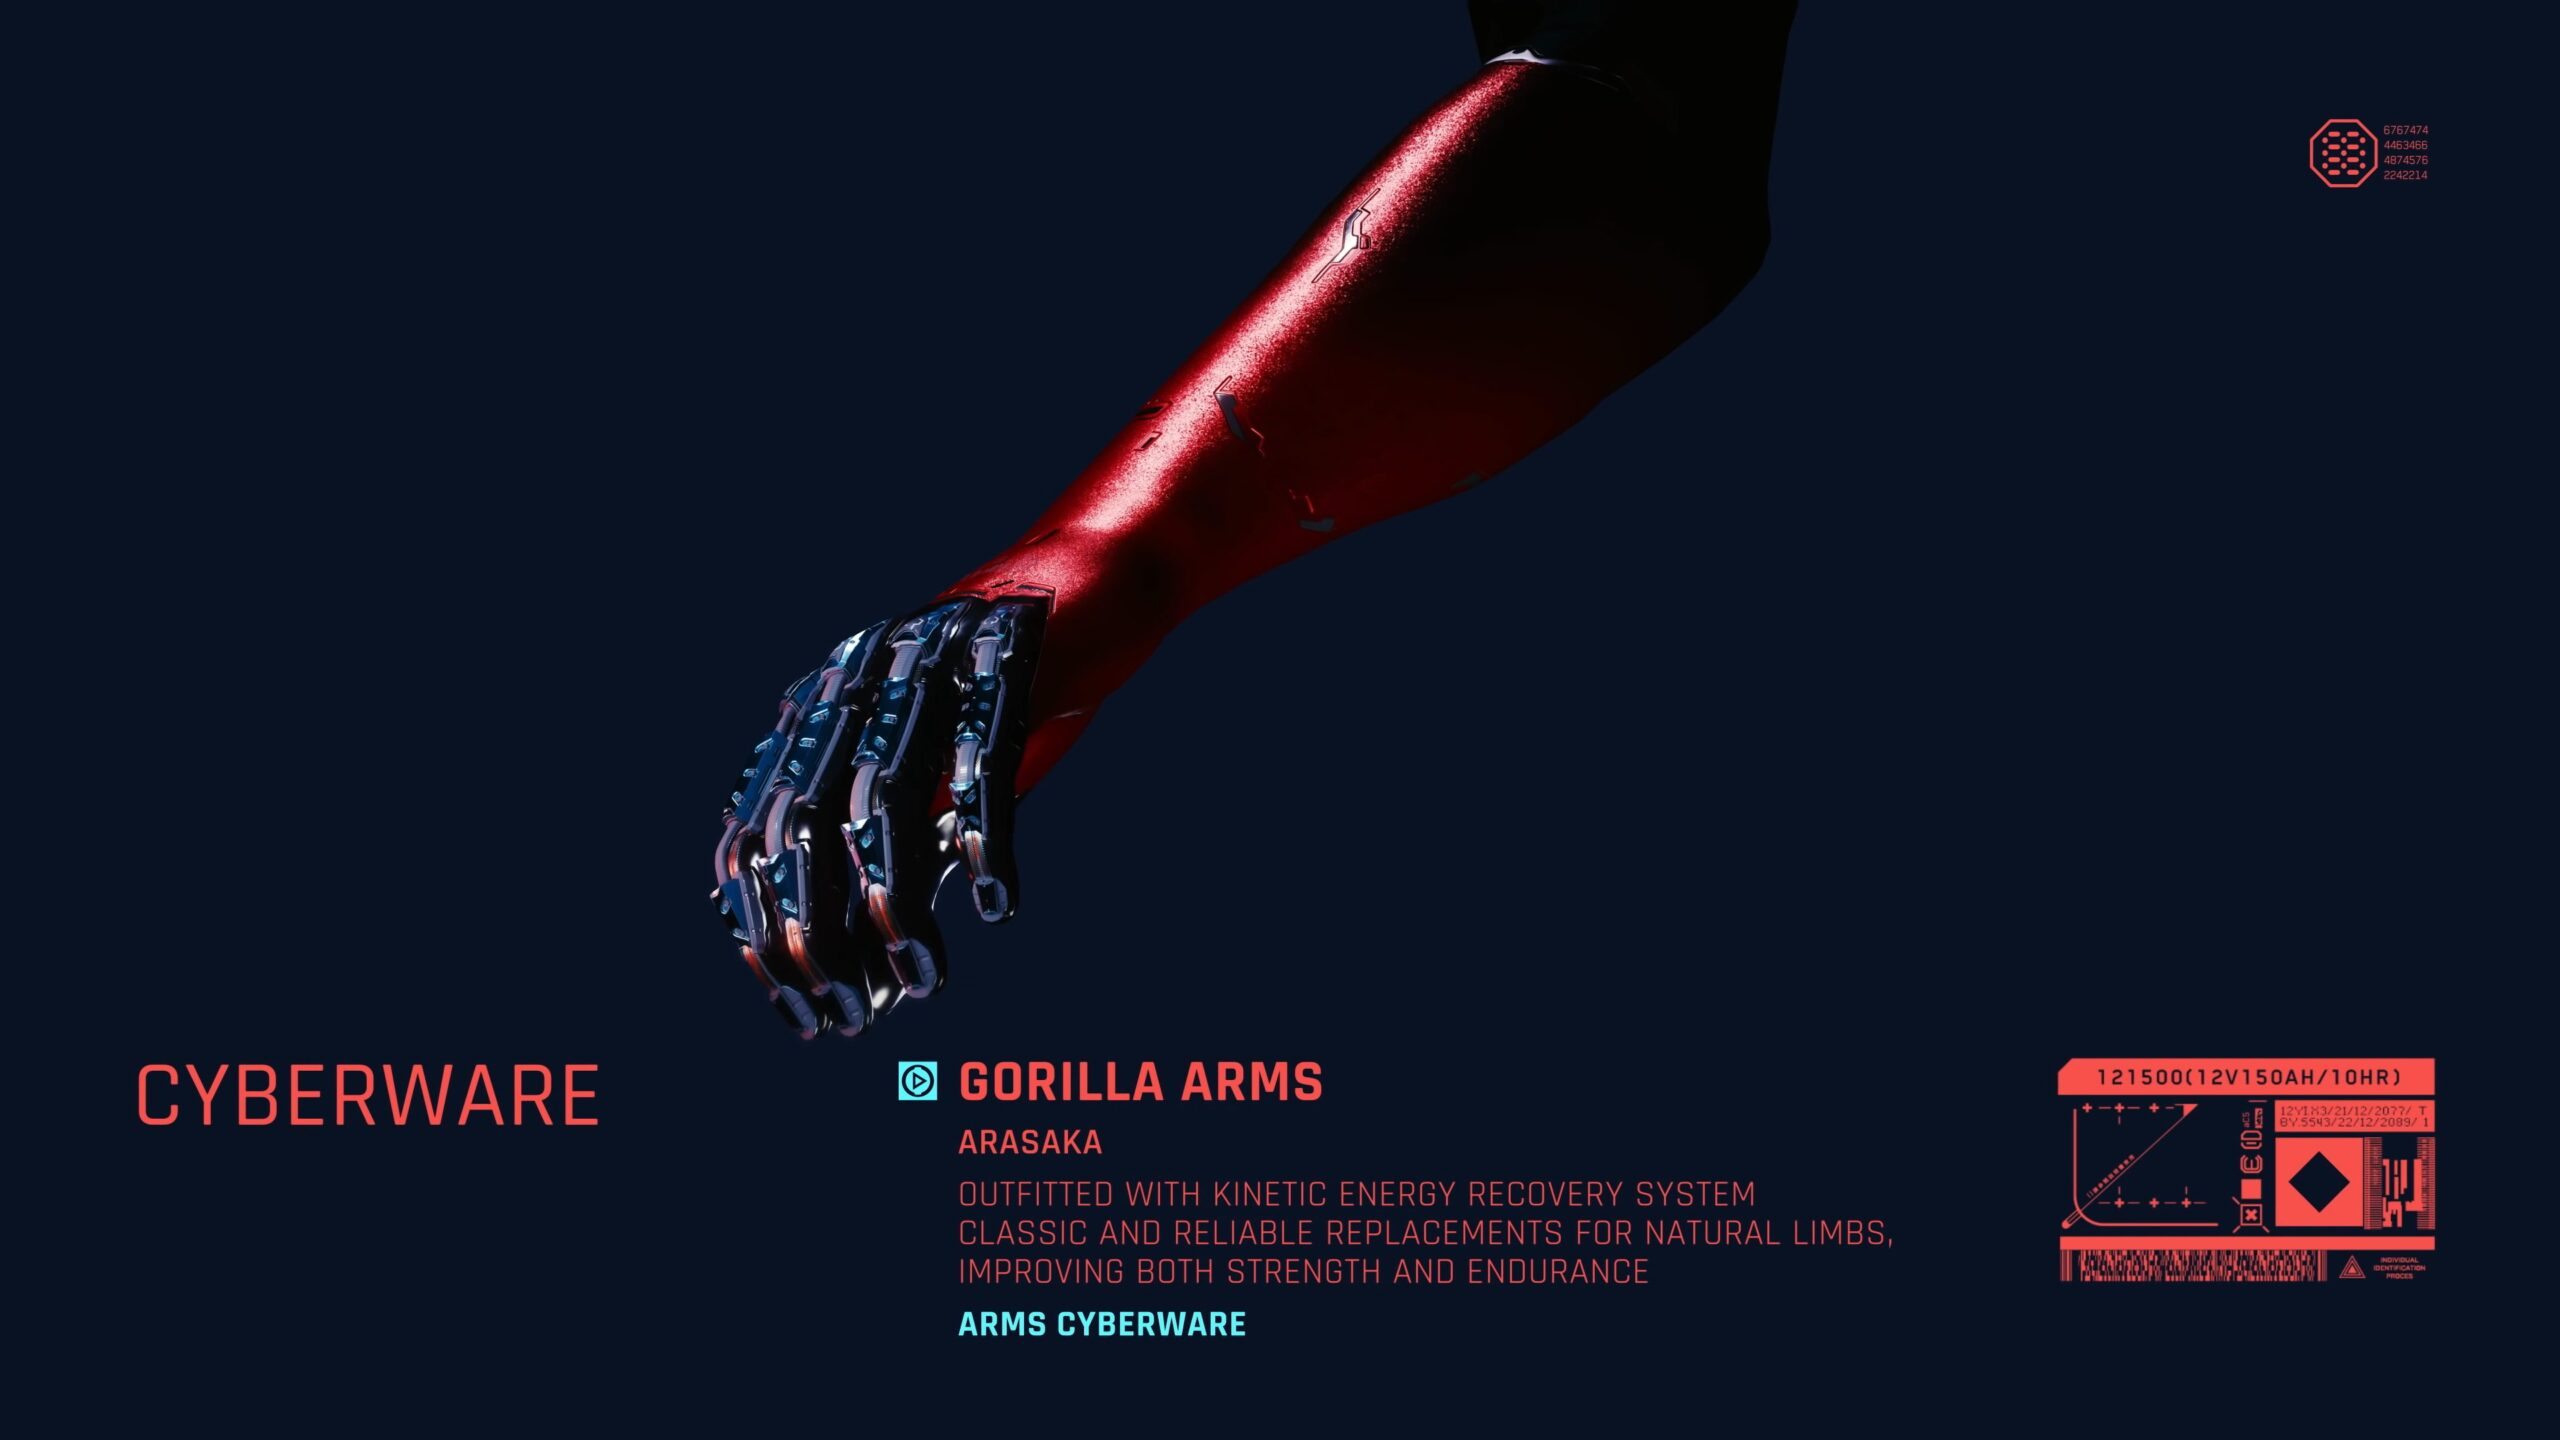 Cyberpunk 2077 Gorilla Arms Melee Cyberware